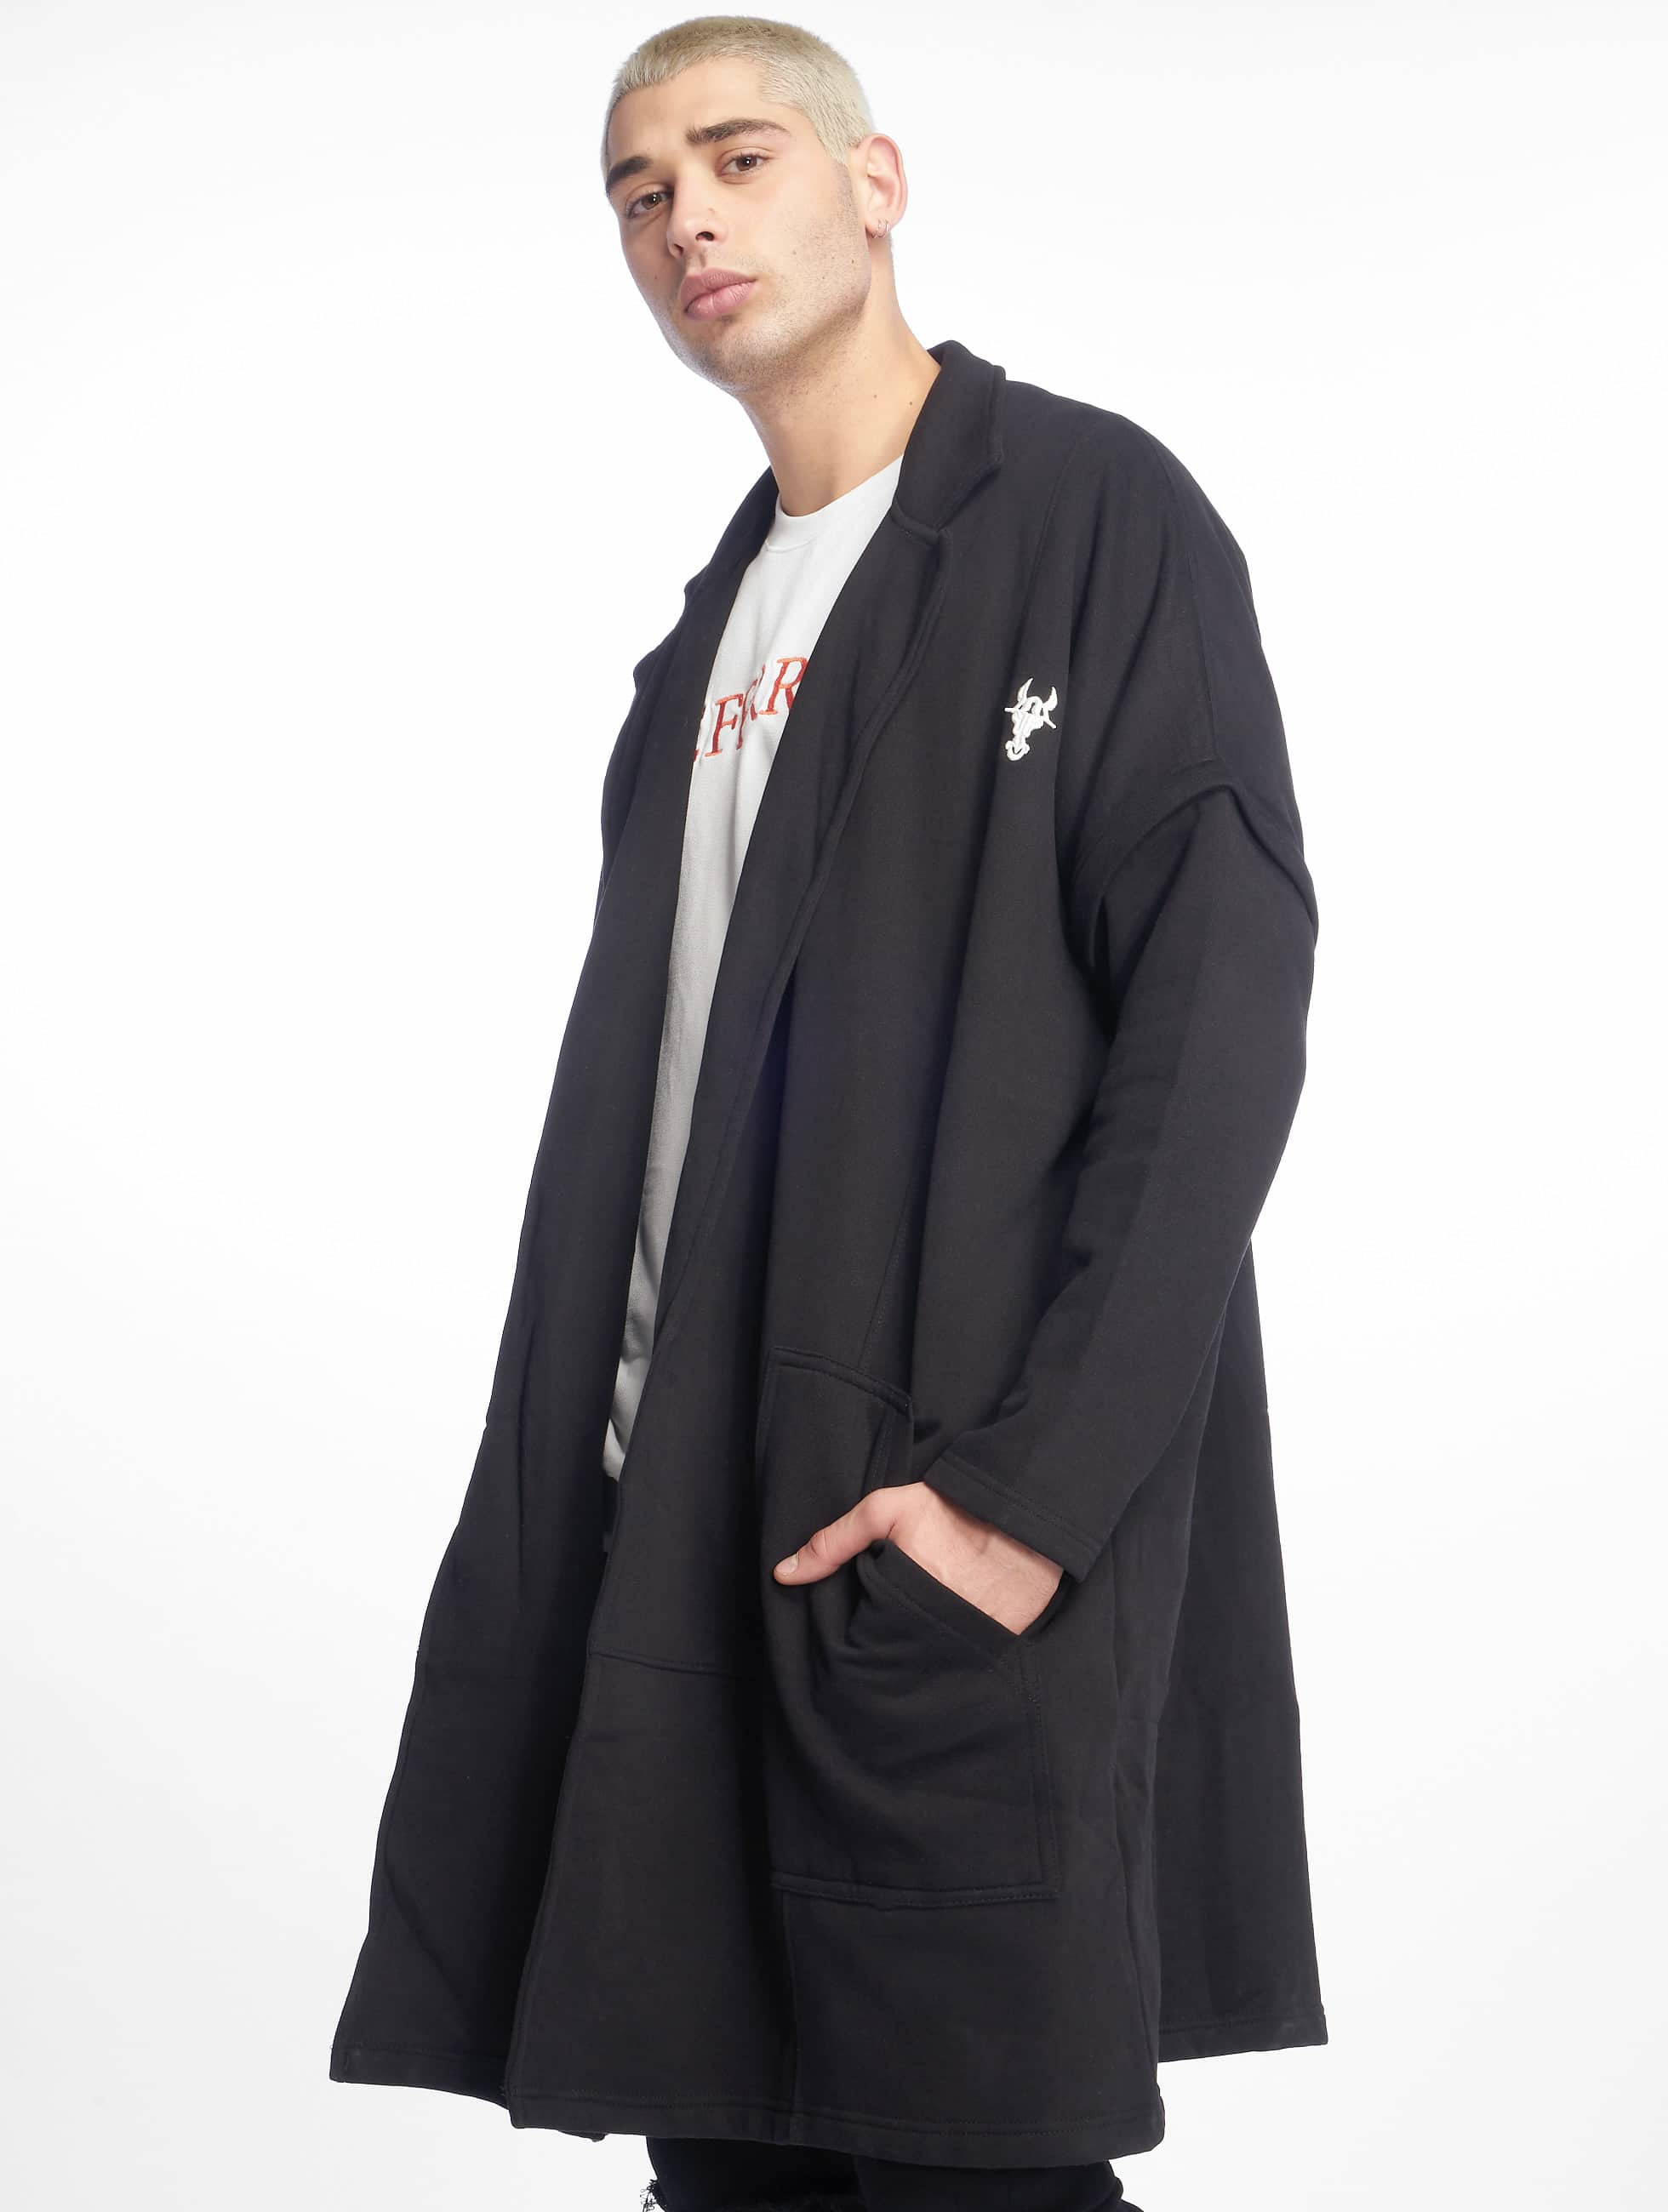 Cavallo de Ferro / Coats Coat in black XL